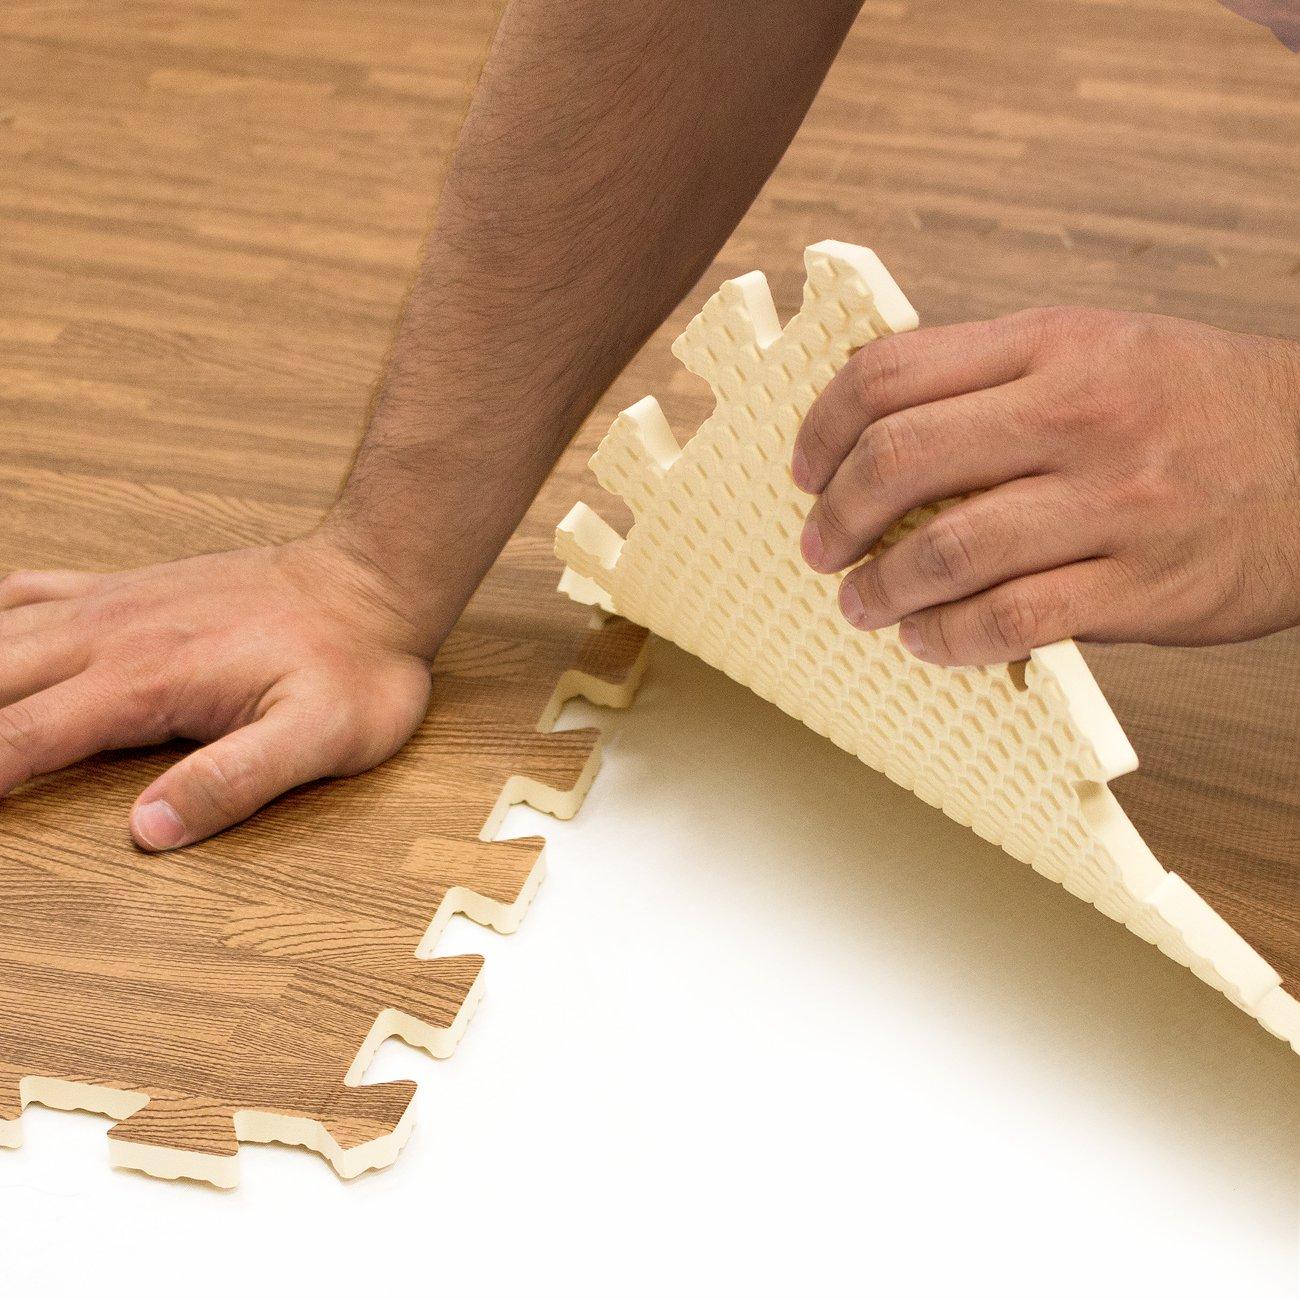 Sorbus Interlocking Floor Mat Print, Wood Grain - Light (6-Piece) by Sorbus (Image #7)